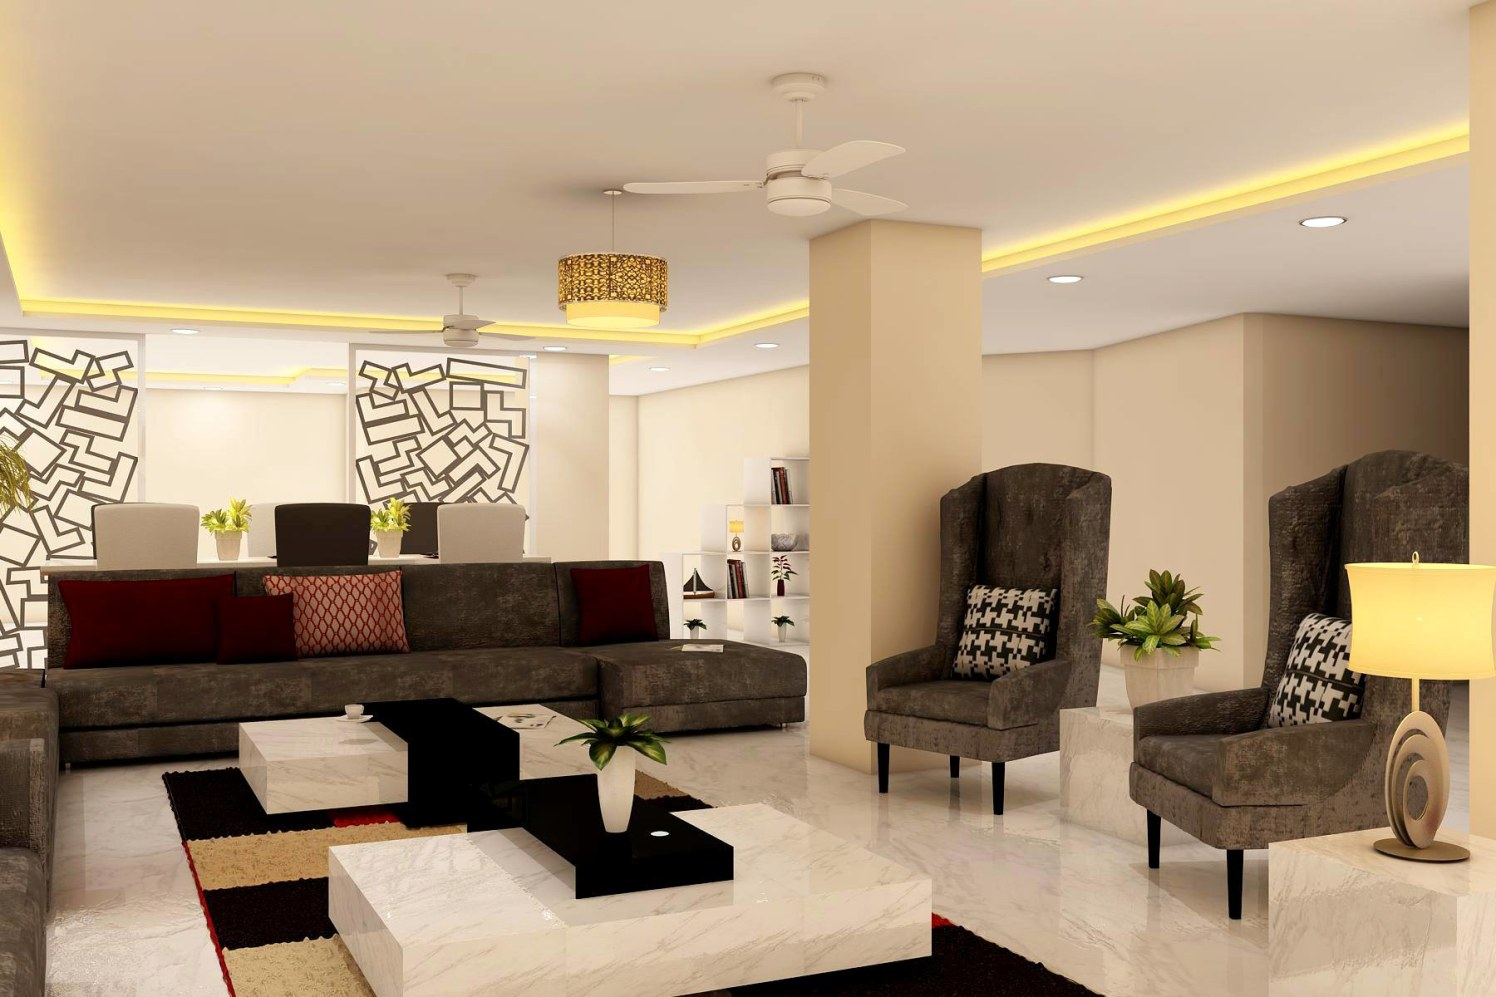 Caramel Cocktail by Wall Designs Contemporary | Interior Design Photos & Ideas